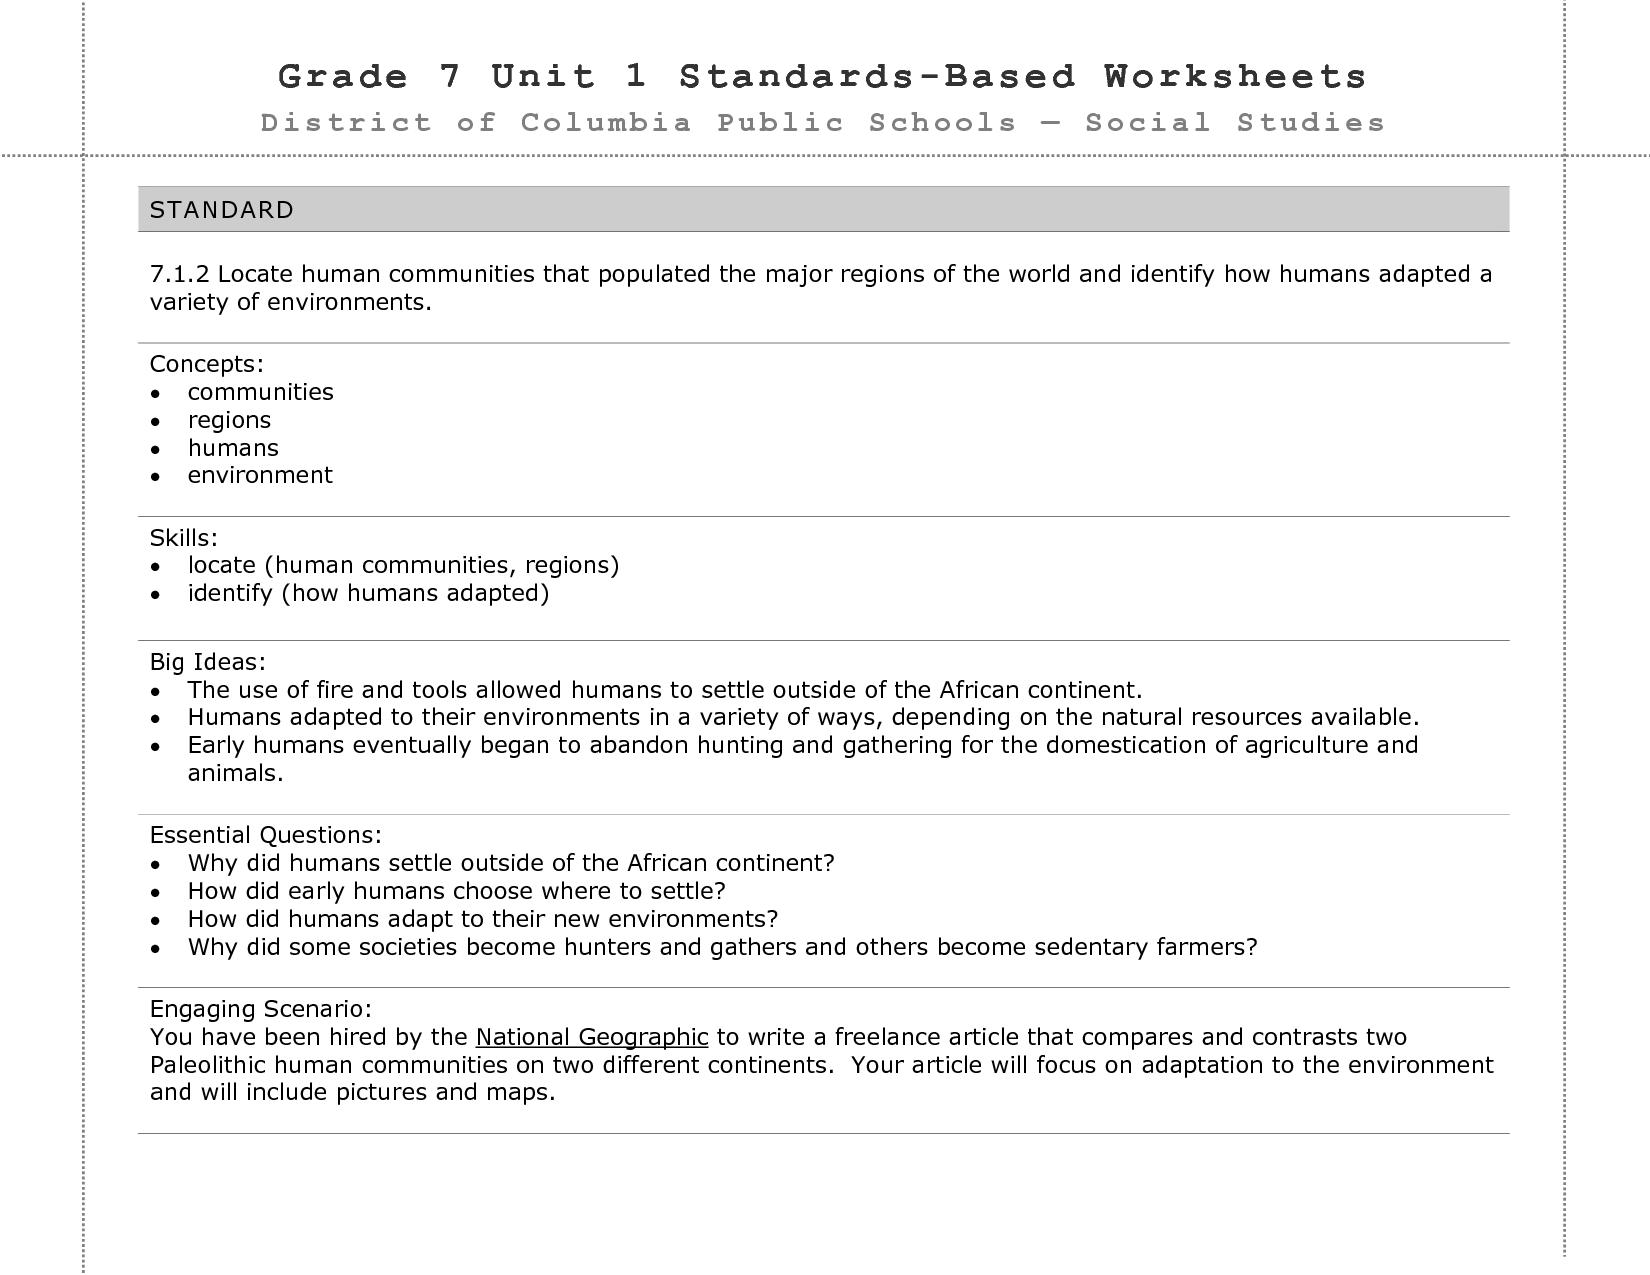 Uncategorized 8th Grade Social Studies Worksheets 100 7th grade social studies worksheets worksheet scope of work template class standards based grading pinterest worksheets